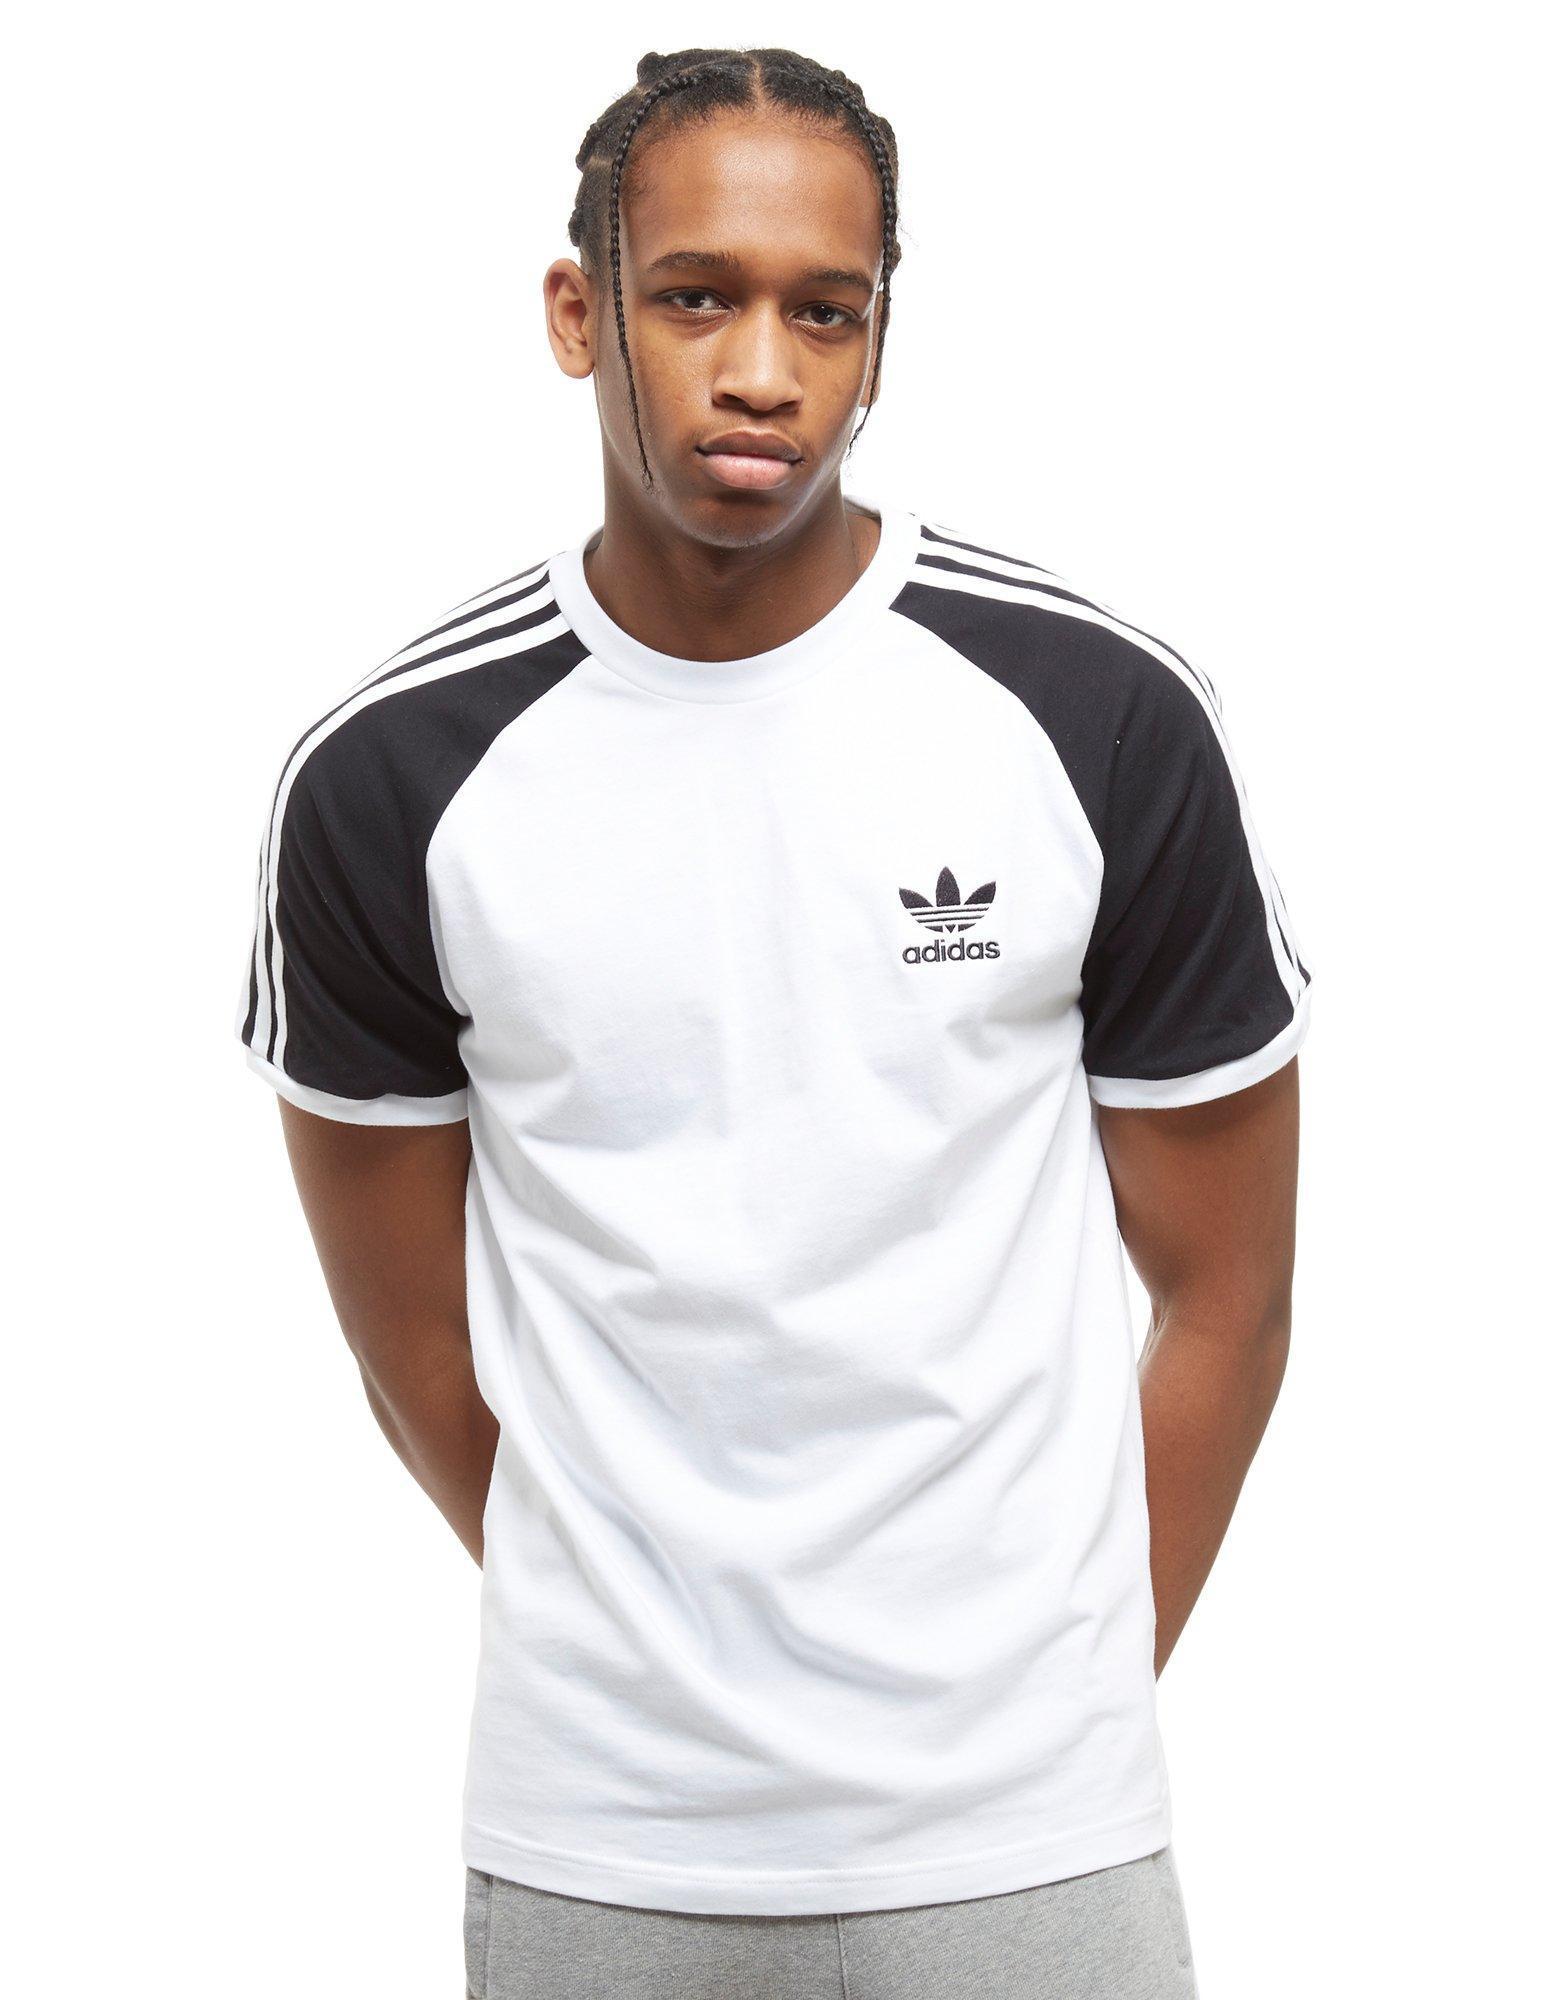 Lyst adidas originali california raglan manica t - shirt per gli uomini.